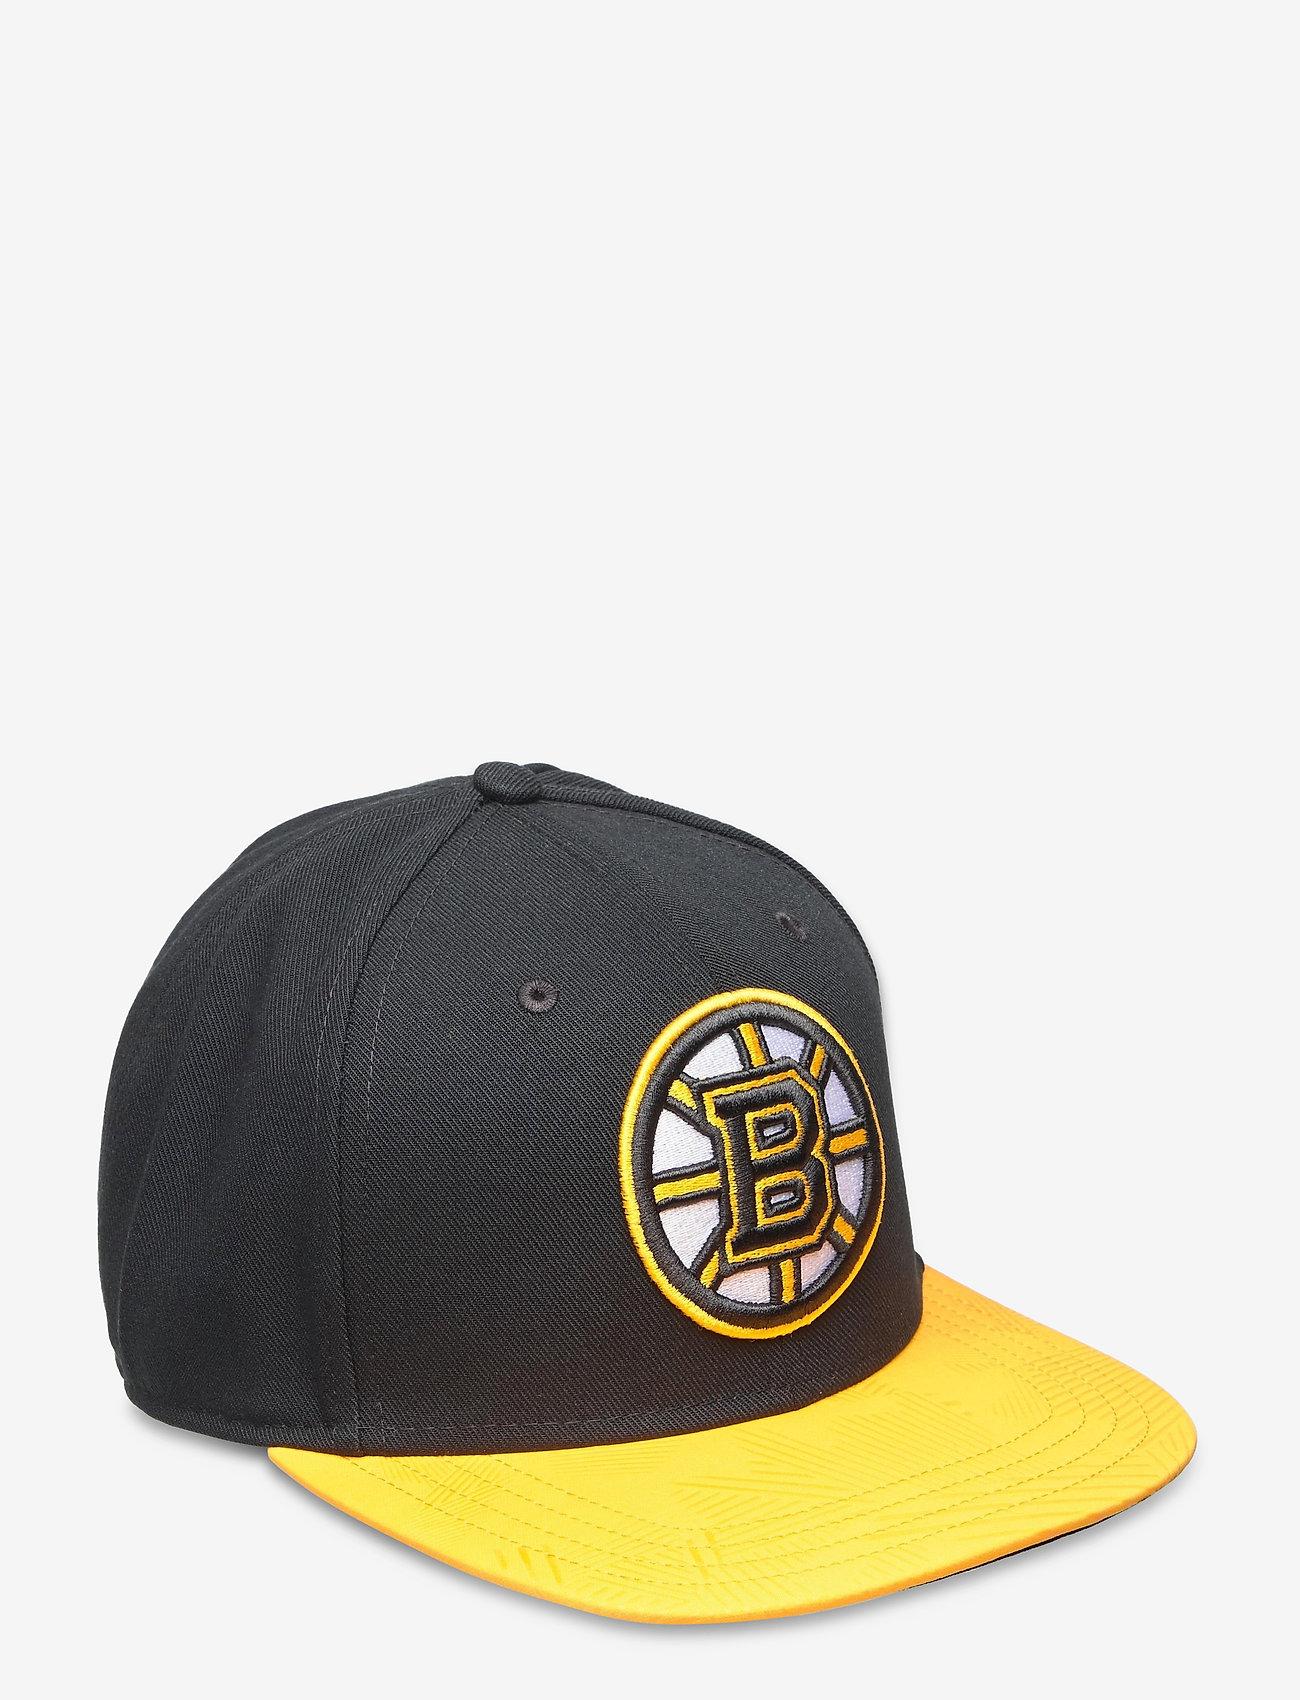 Fanatics - Boston Bruins Iconic Defender Snapback Cap - caps - black/yellow gold - 0